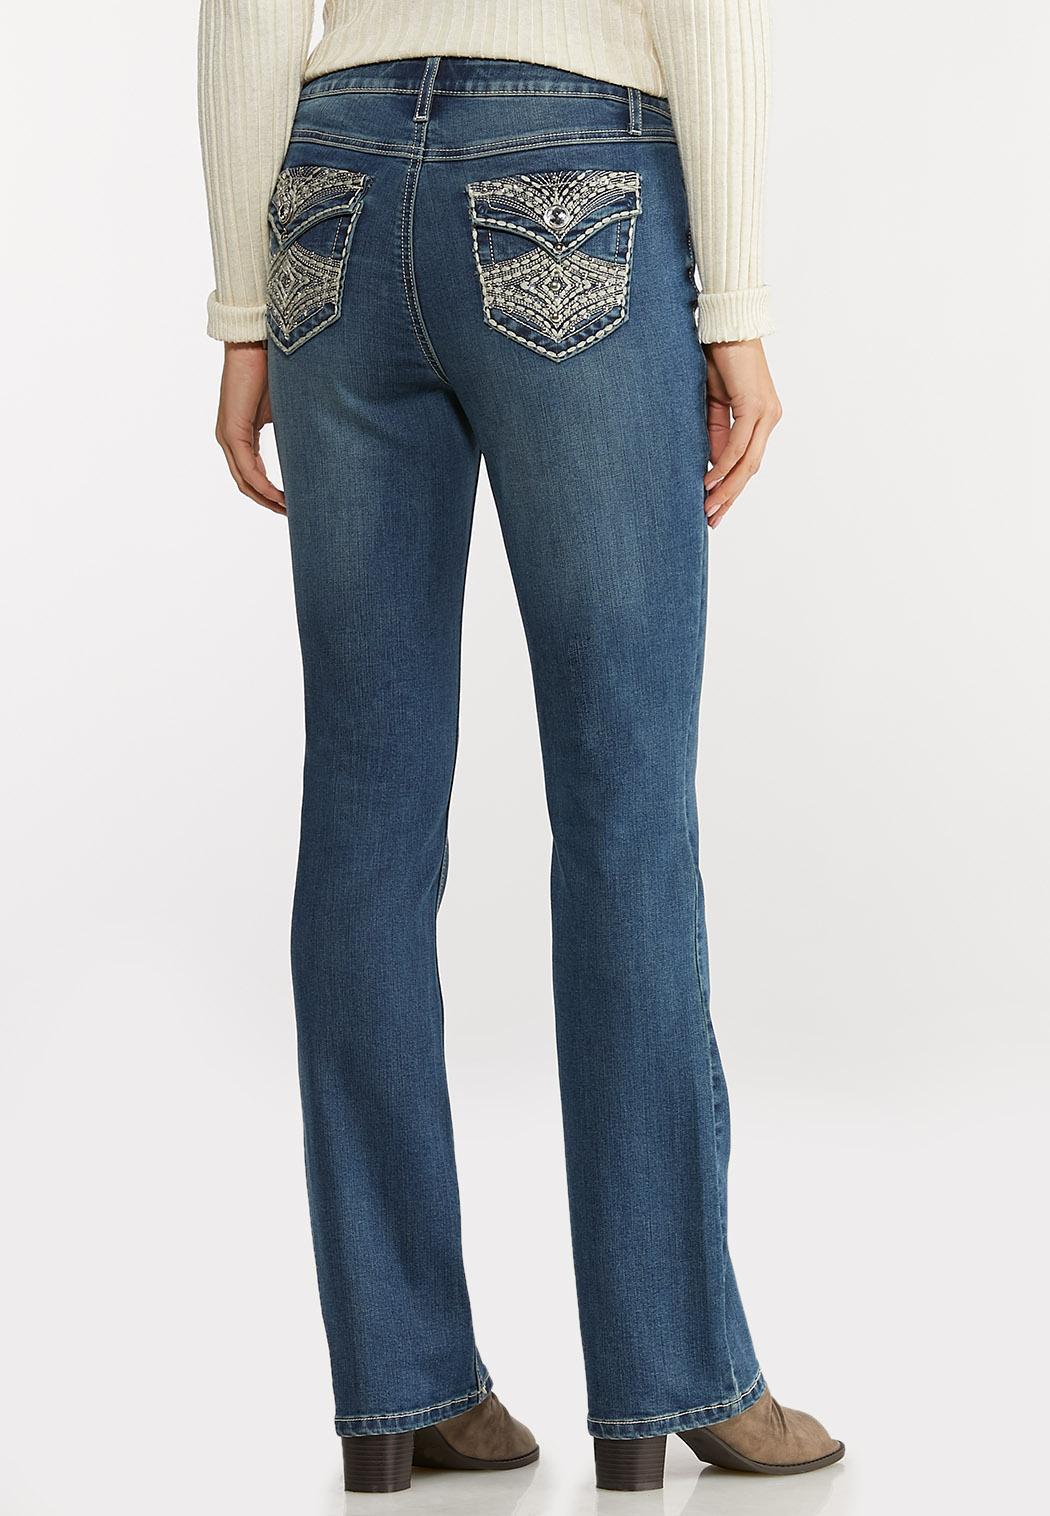 Petite Stud Stitch Bootcut Jeans (Item #44097572)